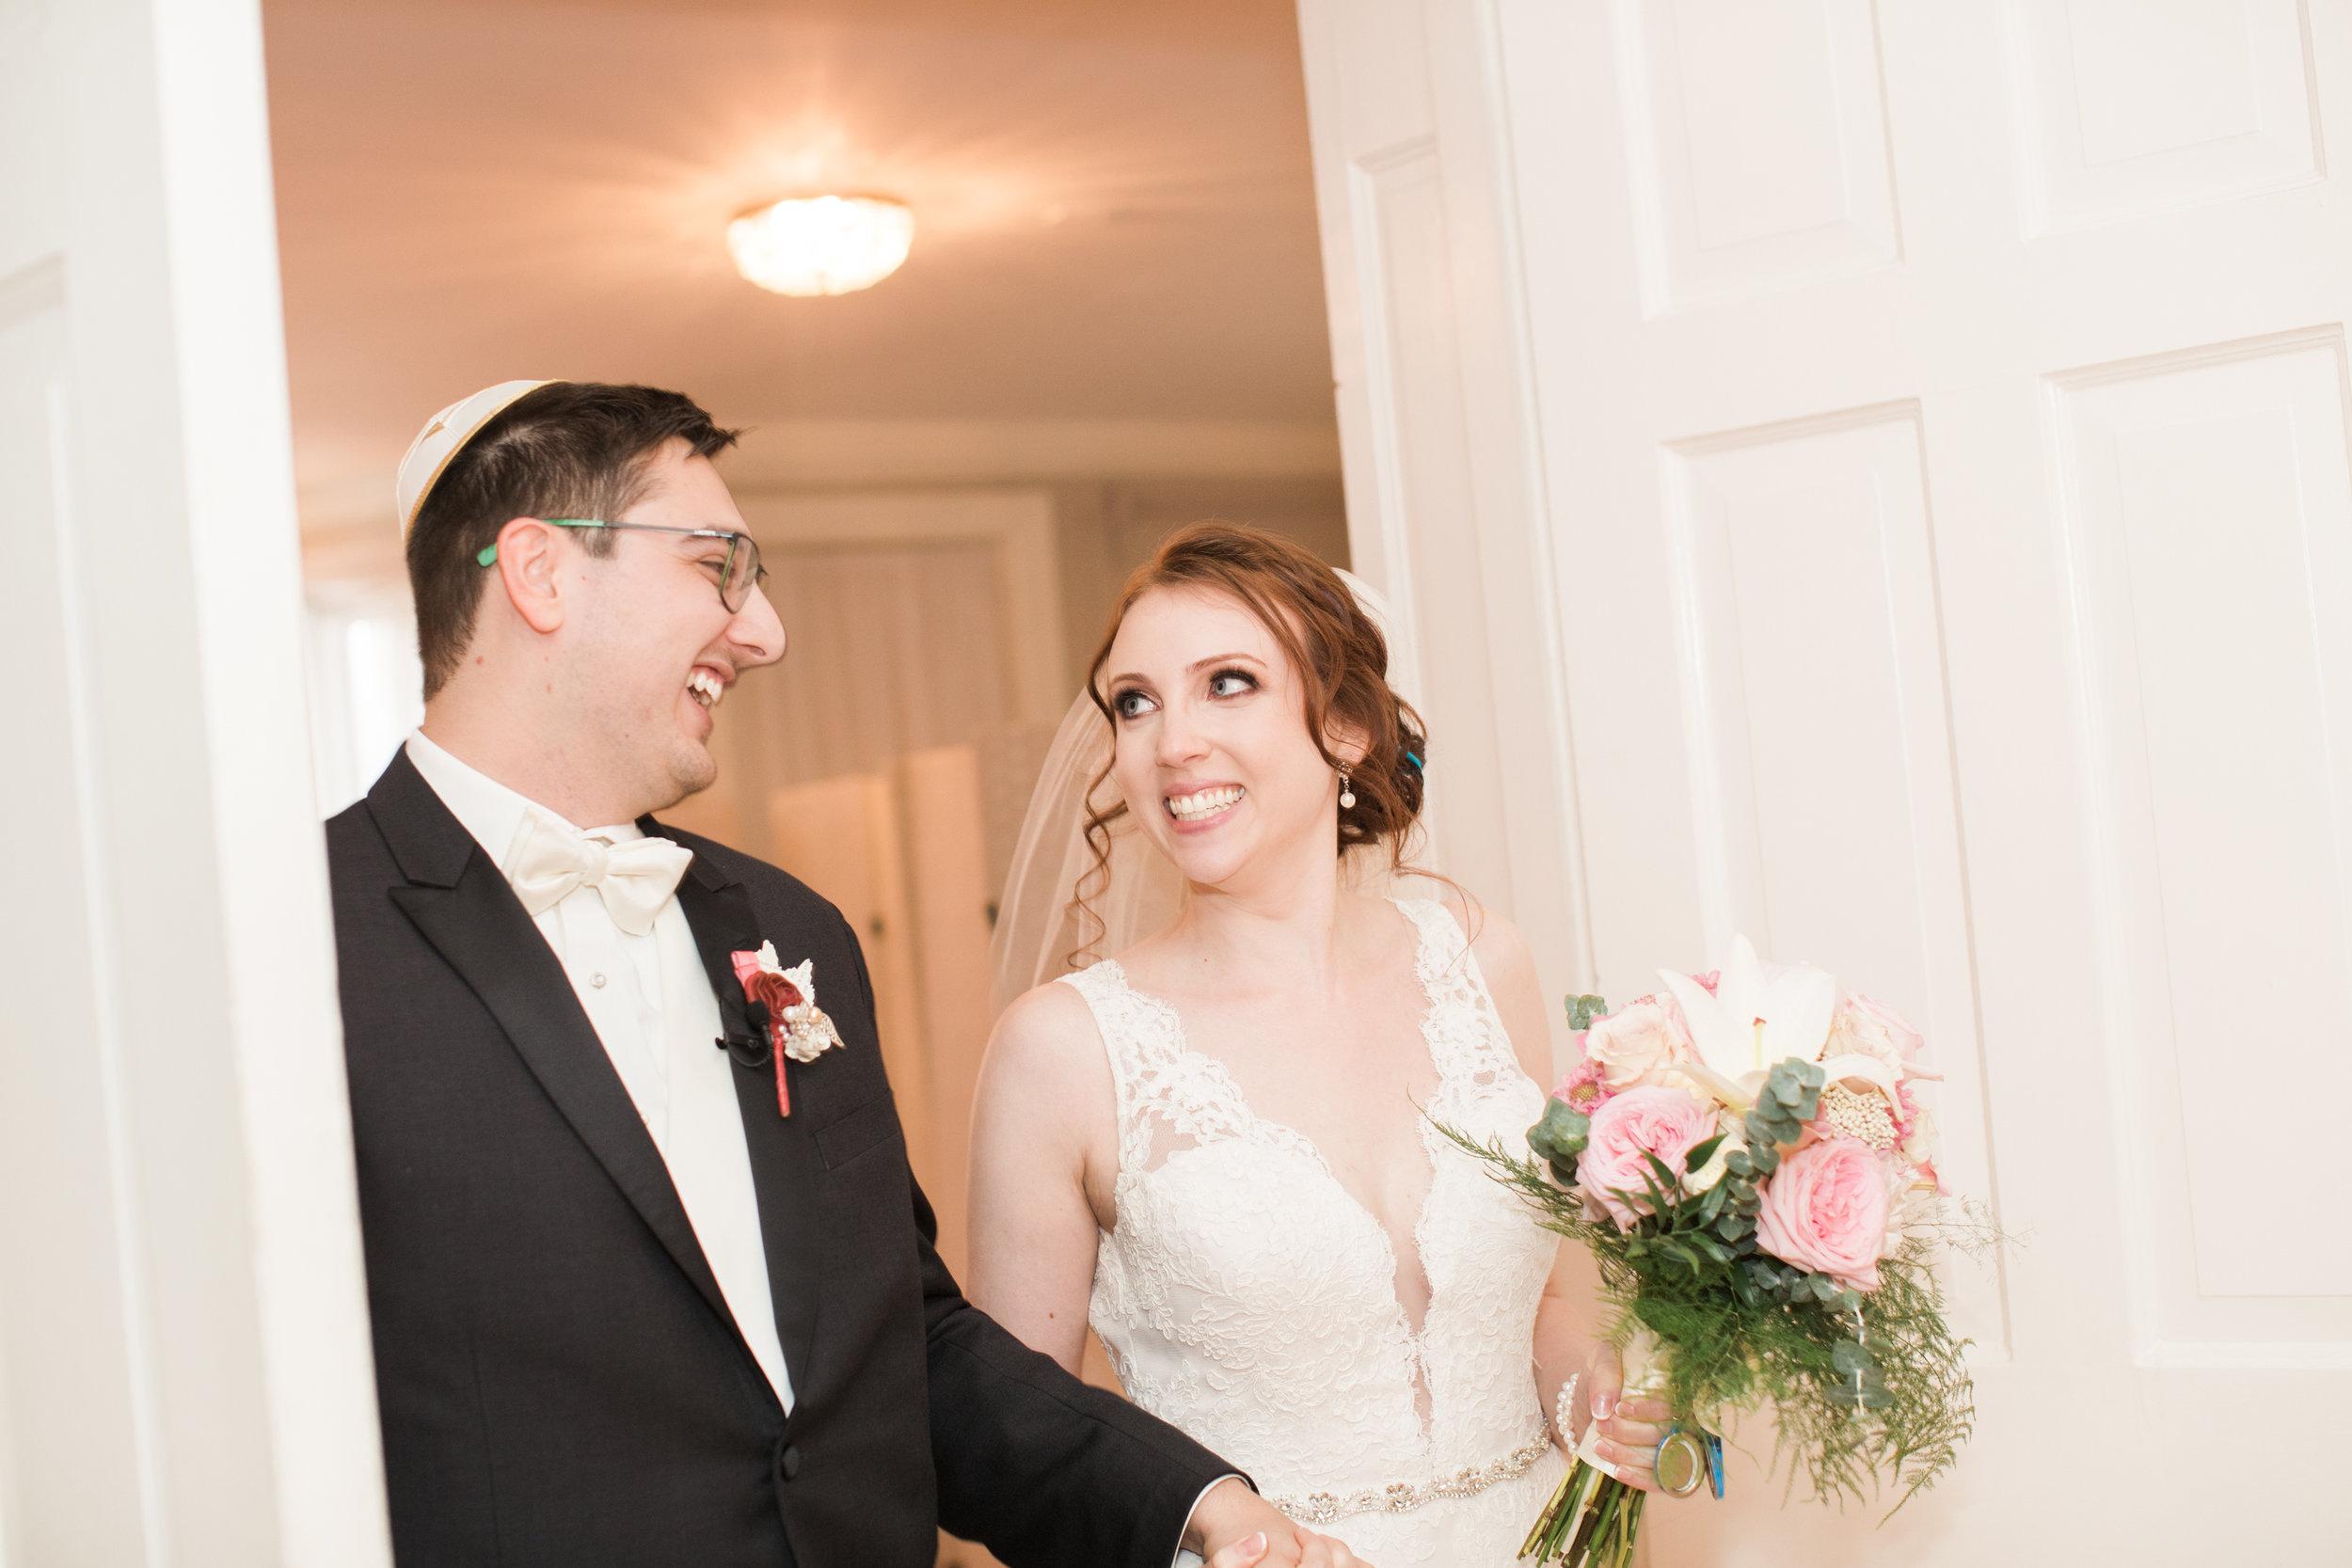 Harry Potter Wedding at Overhills Mansion Catonville Maryland Wedding Photographers Megapixels Media (81 of 134).jpg